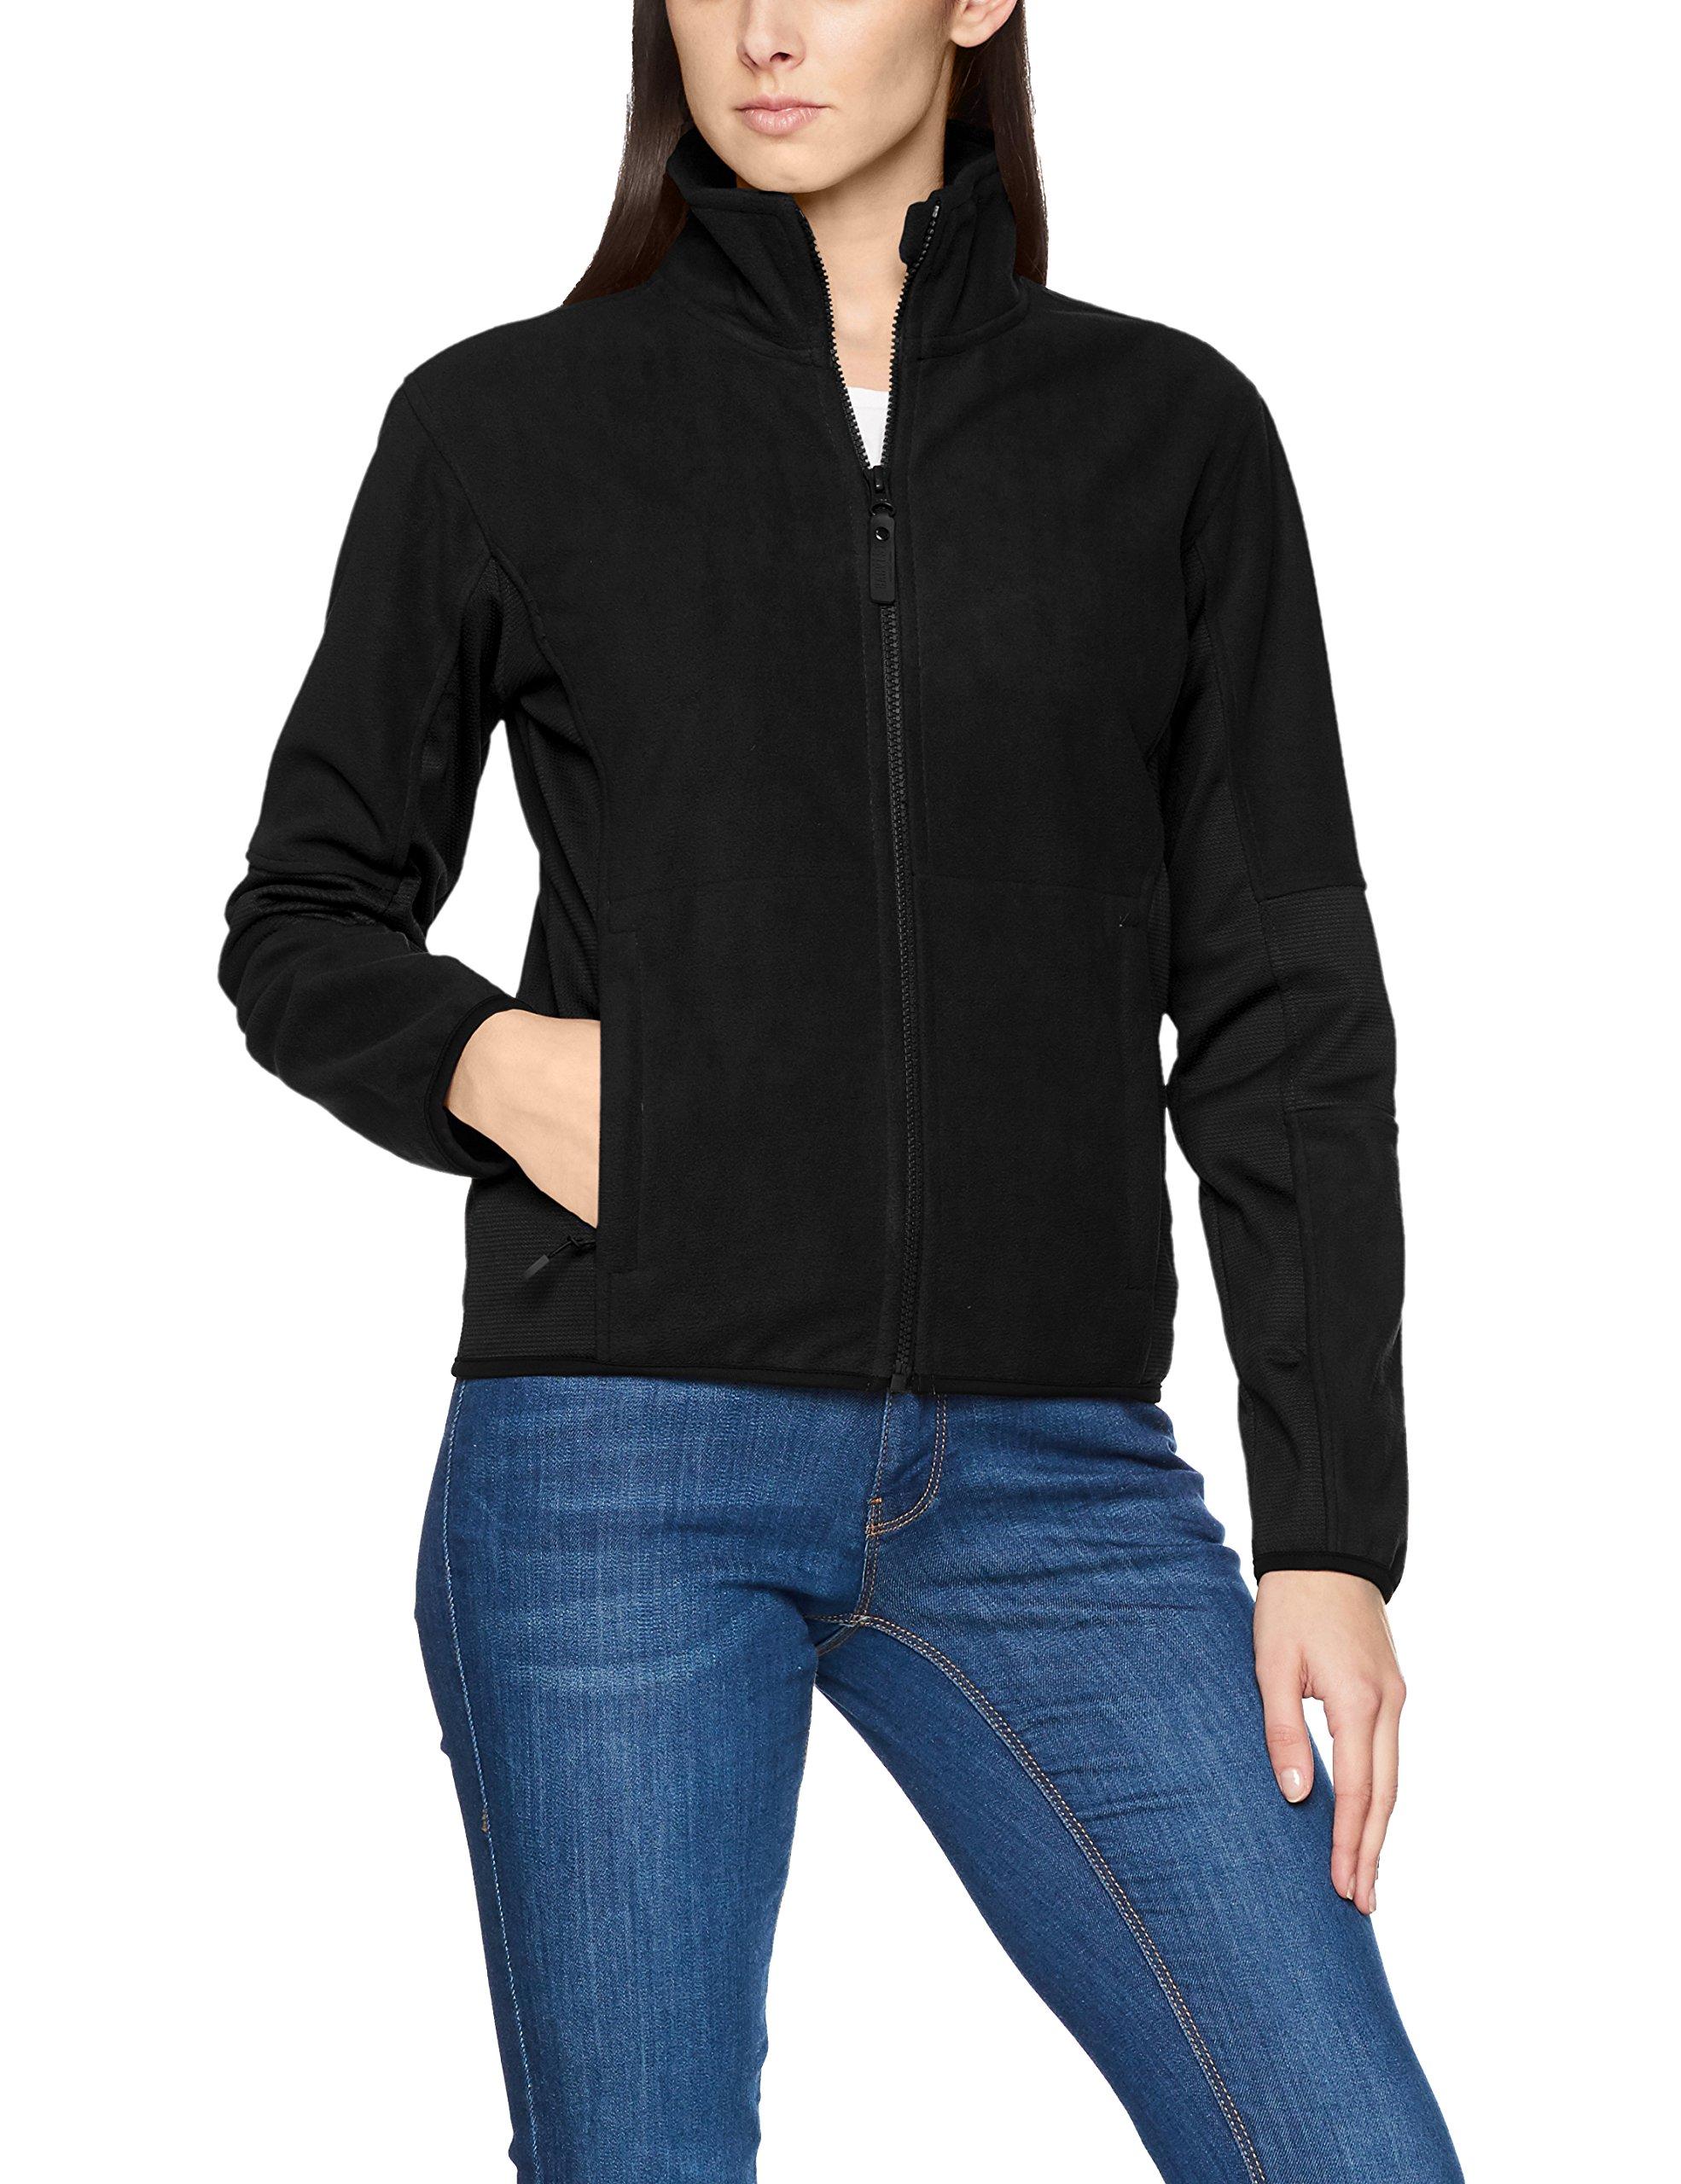 Full BlousonNoirblack Femme Harvest Sarasota Jacket James Zip Fleece 90038 OXZPiuTwk